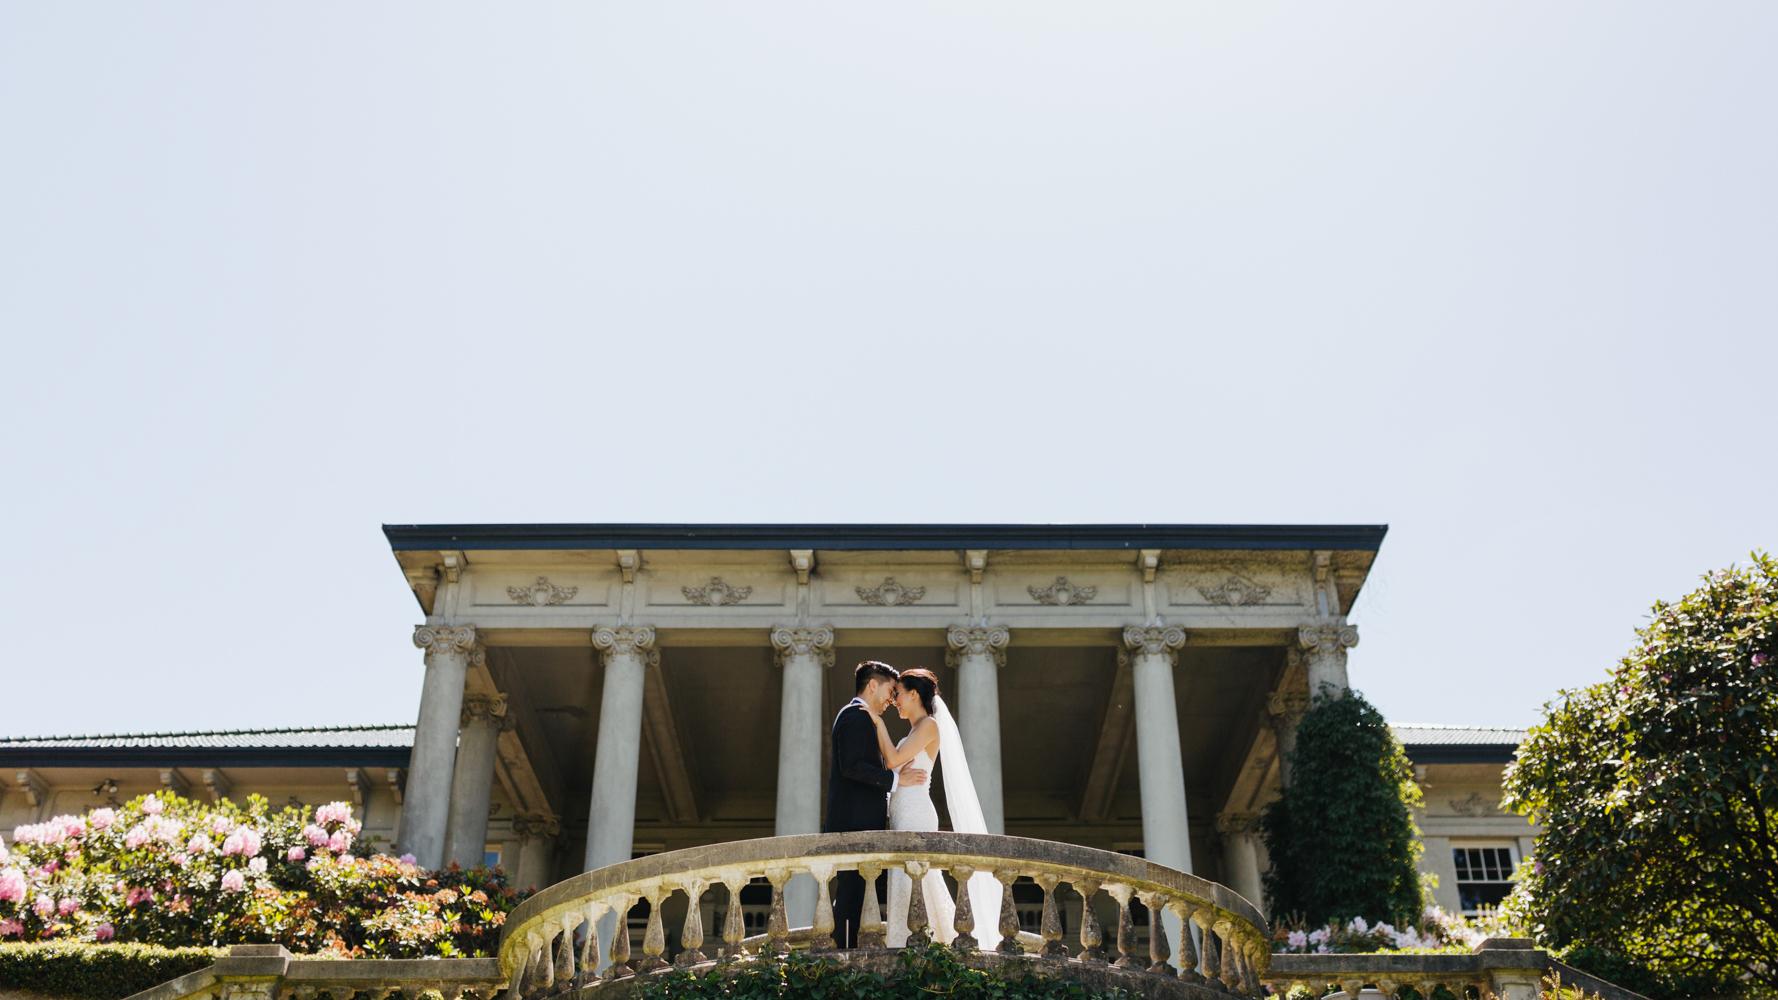 herafilms_wedding_lisa_arthur_hera_selects_web-51.jpg